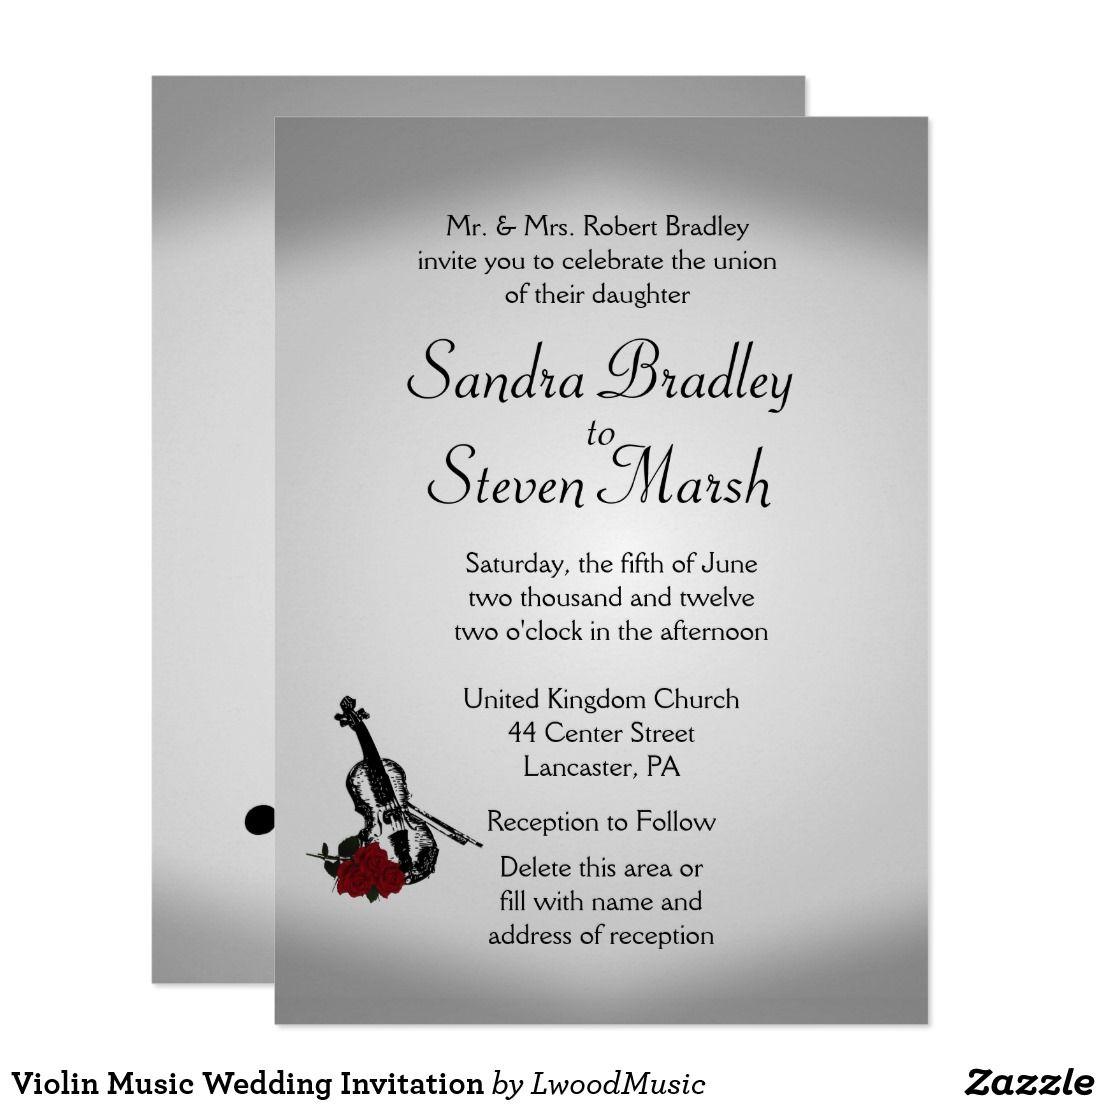 Violin Music Wedding Invitation  Zazzle.com  Music wedding